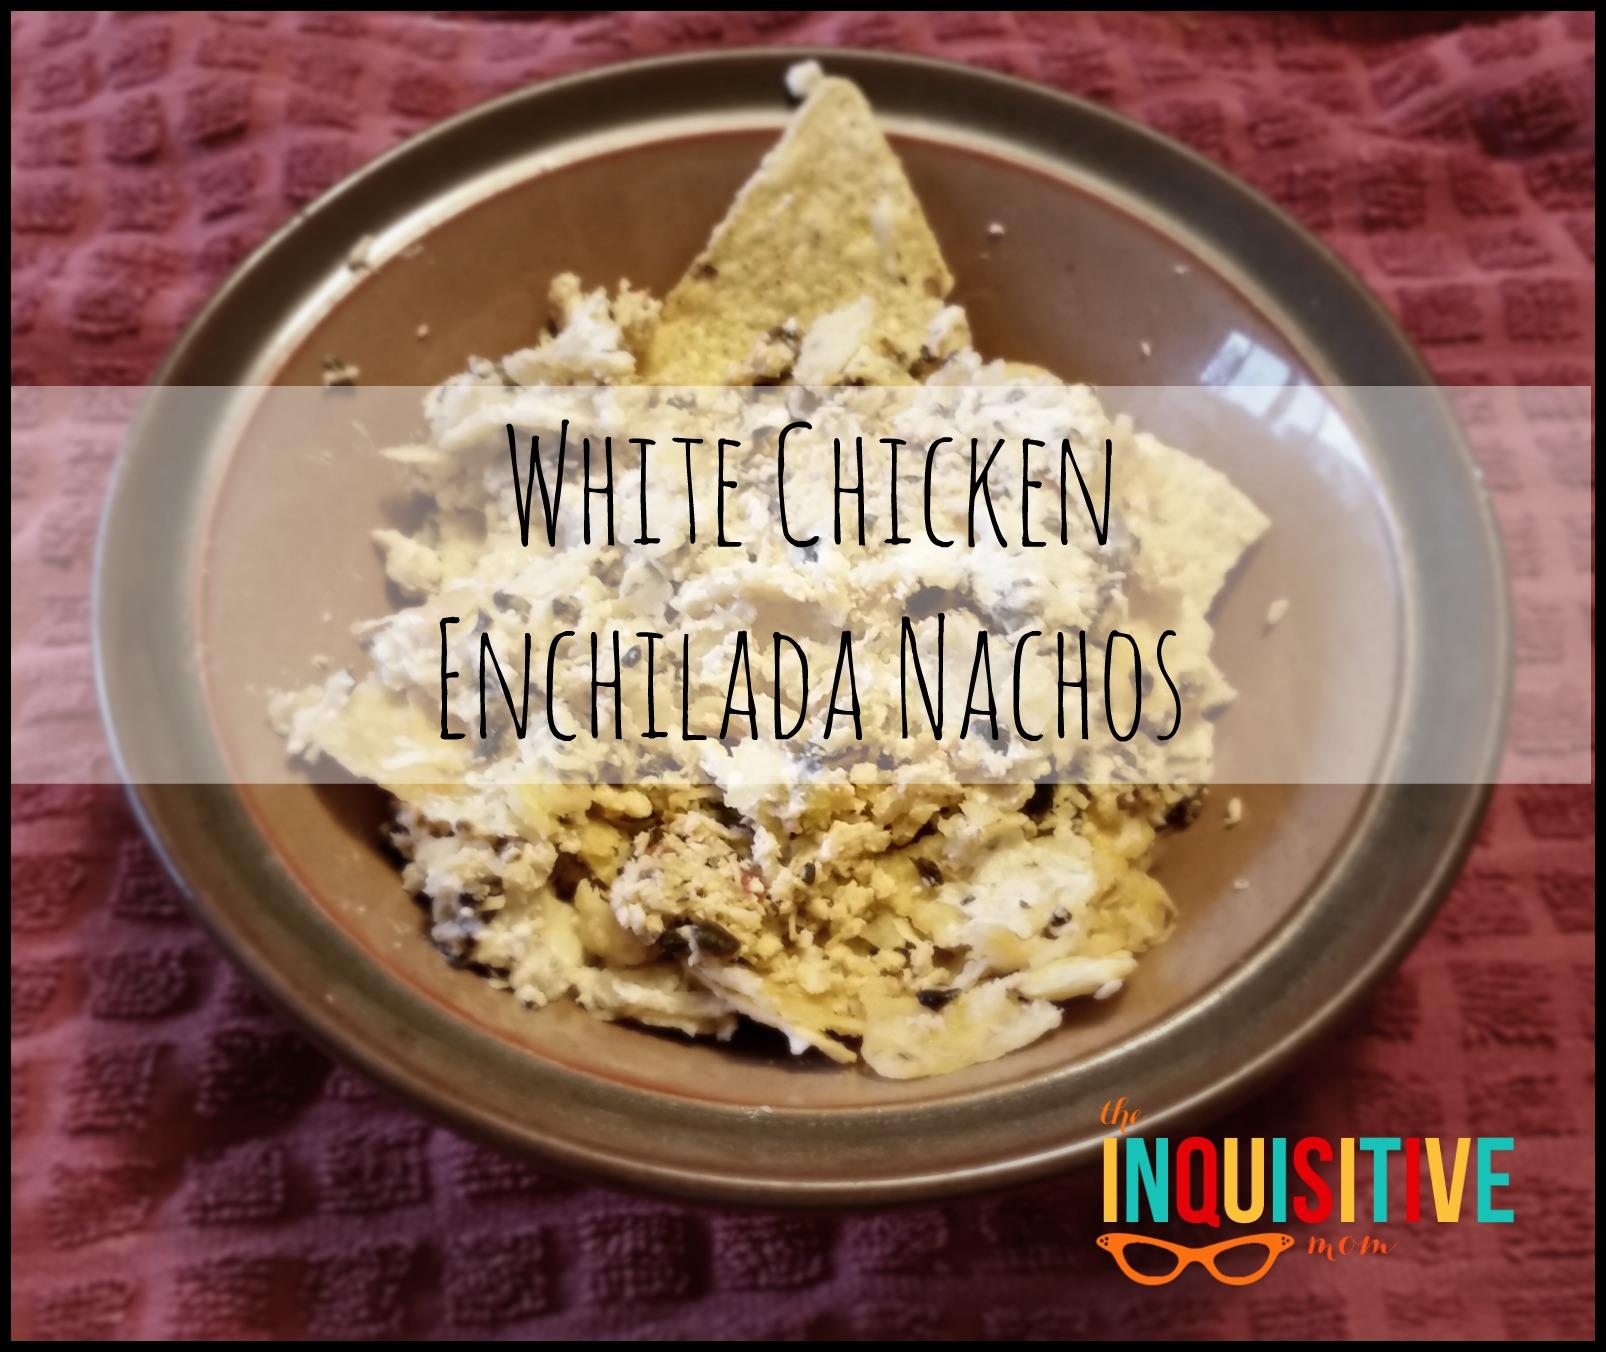 White Chicken Enchilada Nachos